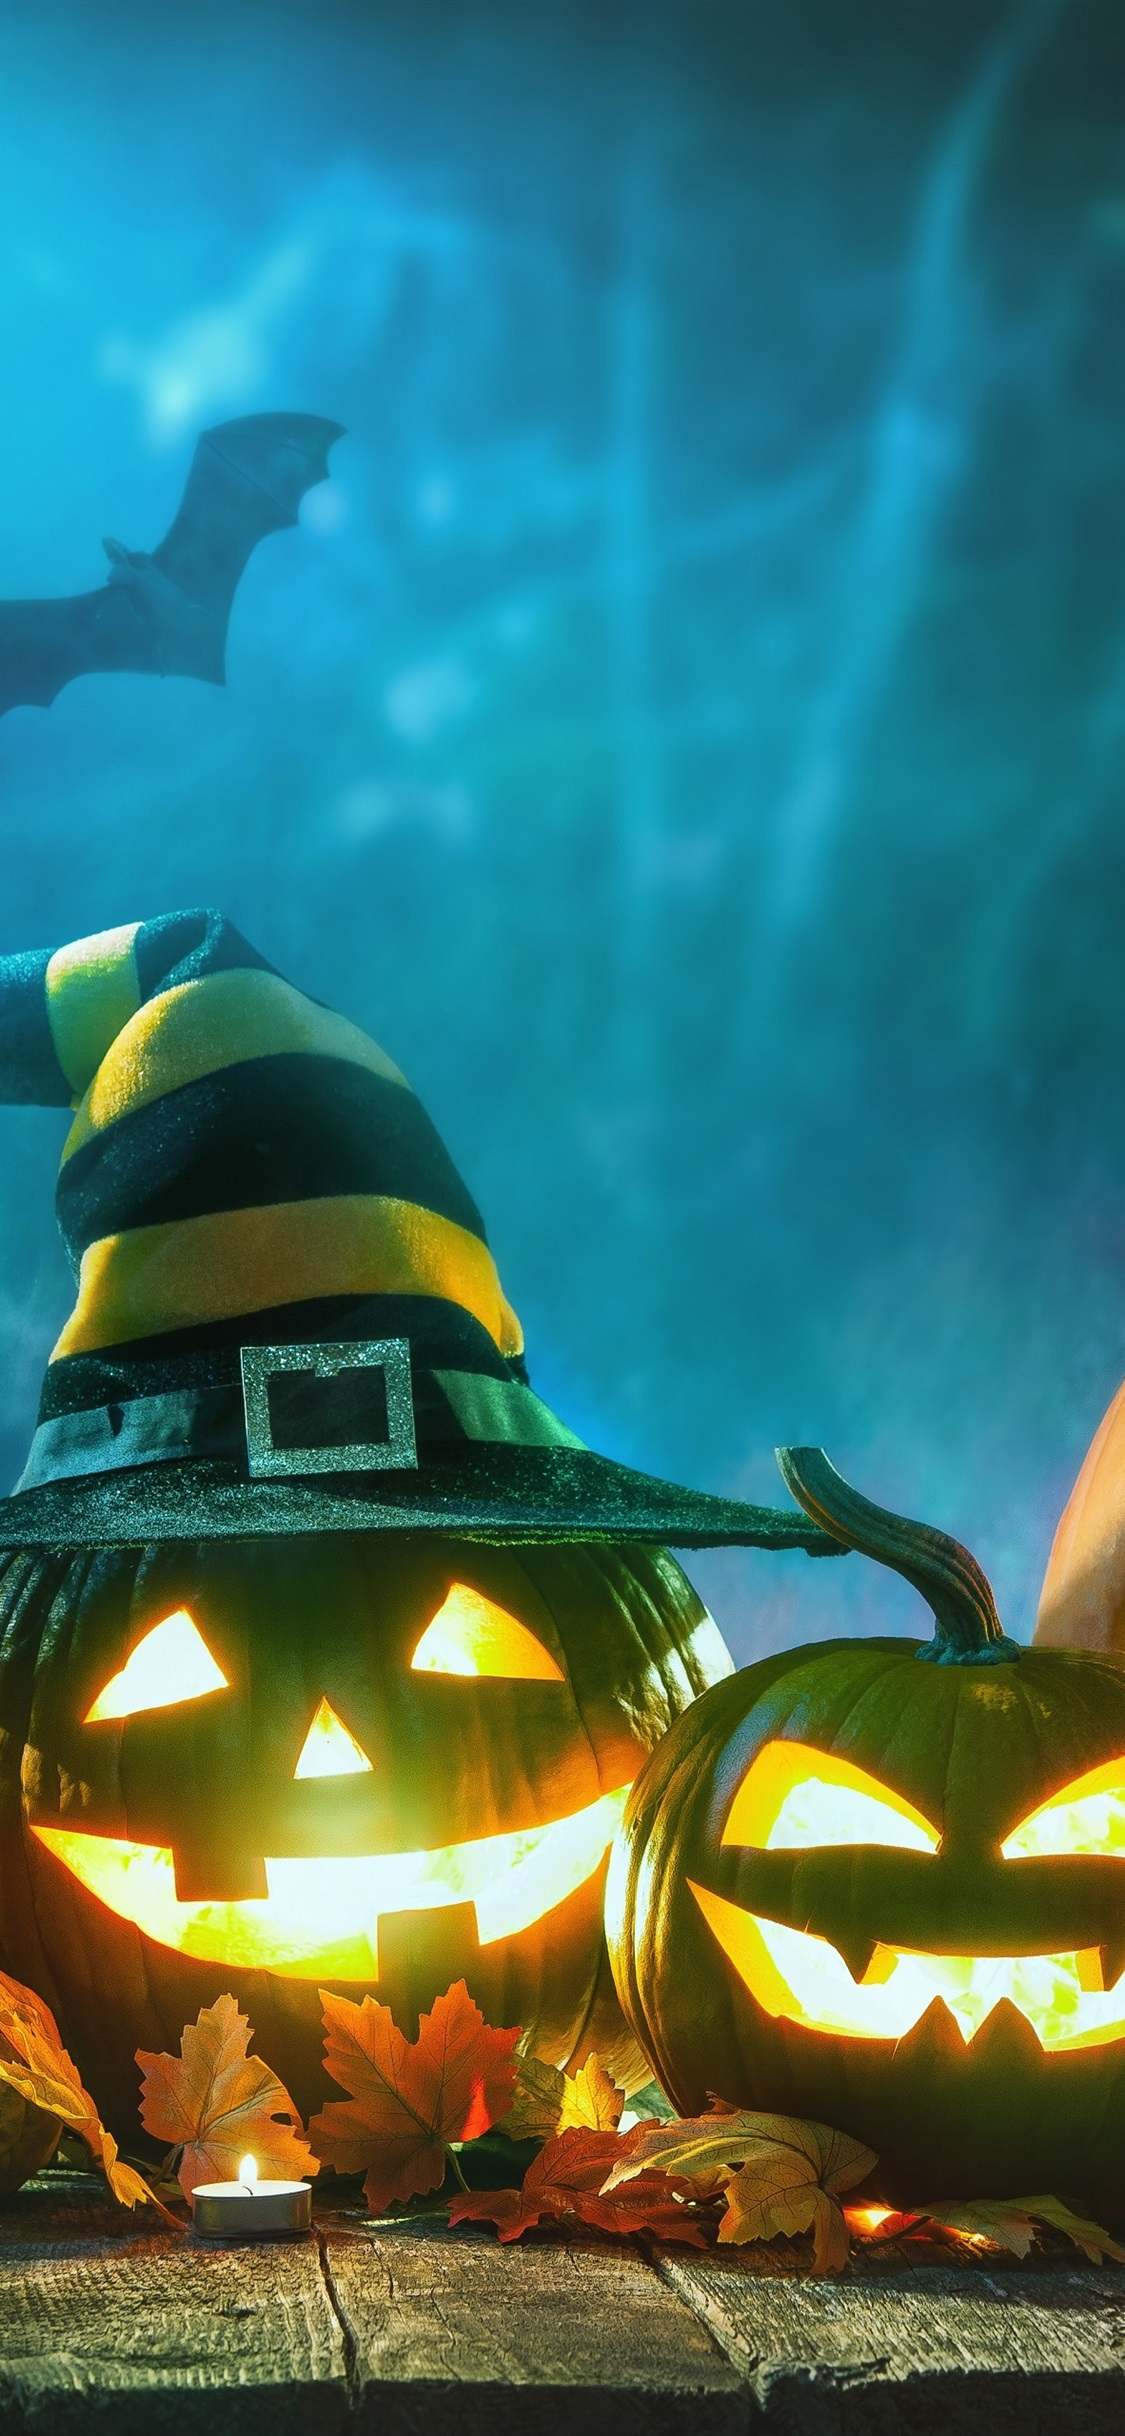 Halloween Kurbislampe Nacht 1125x2436 Iphone Xs X